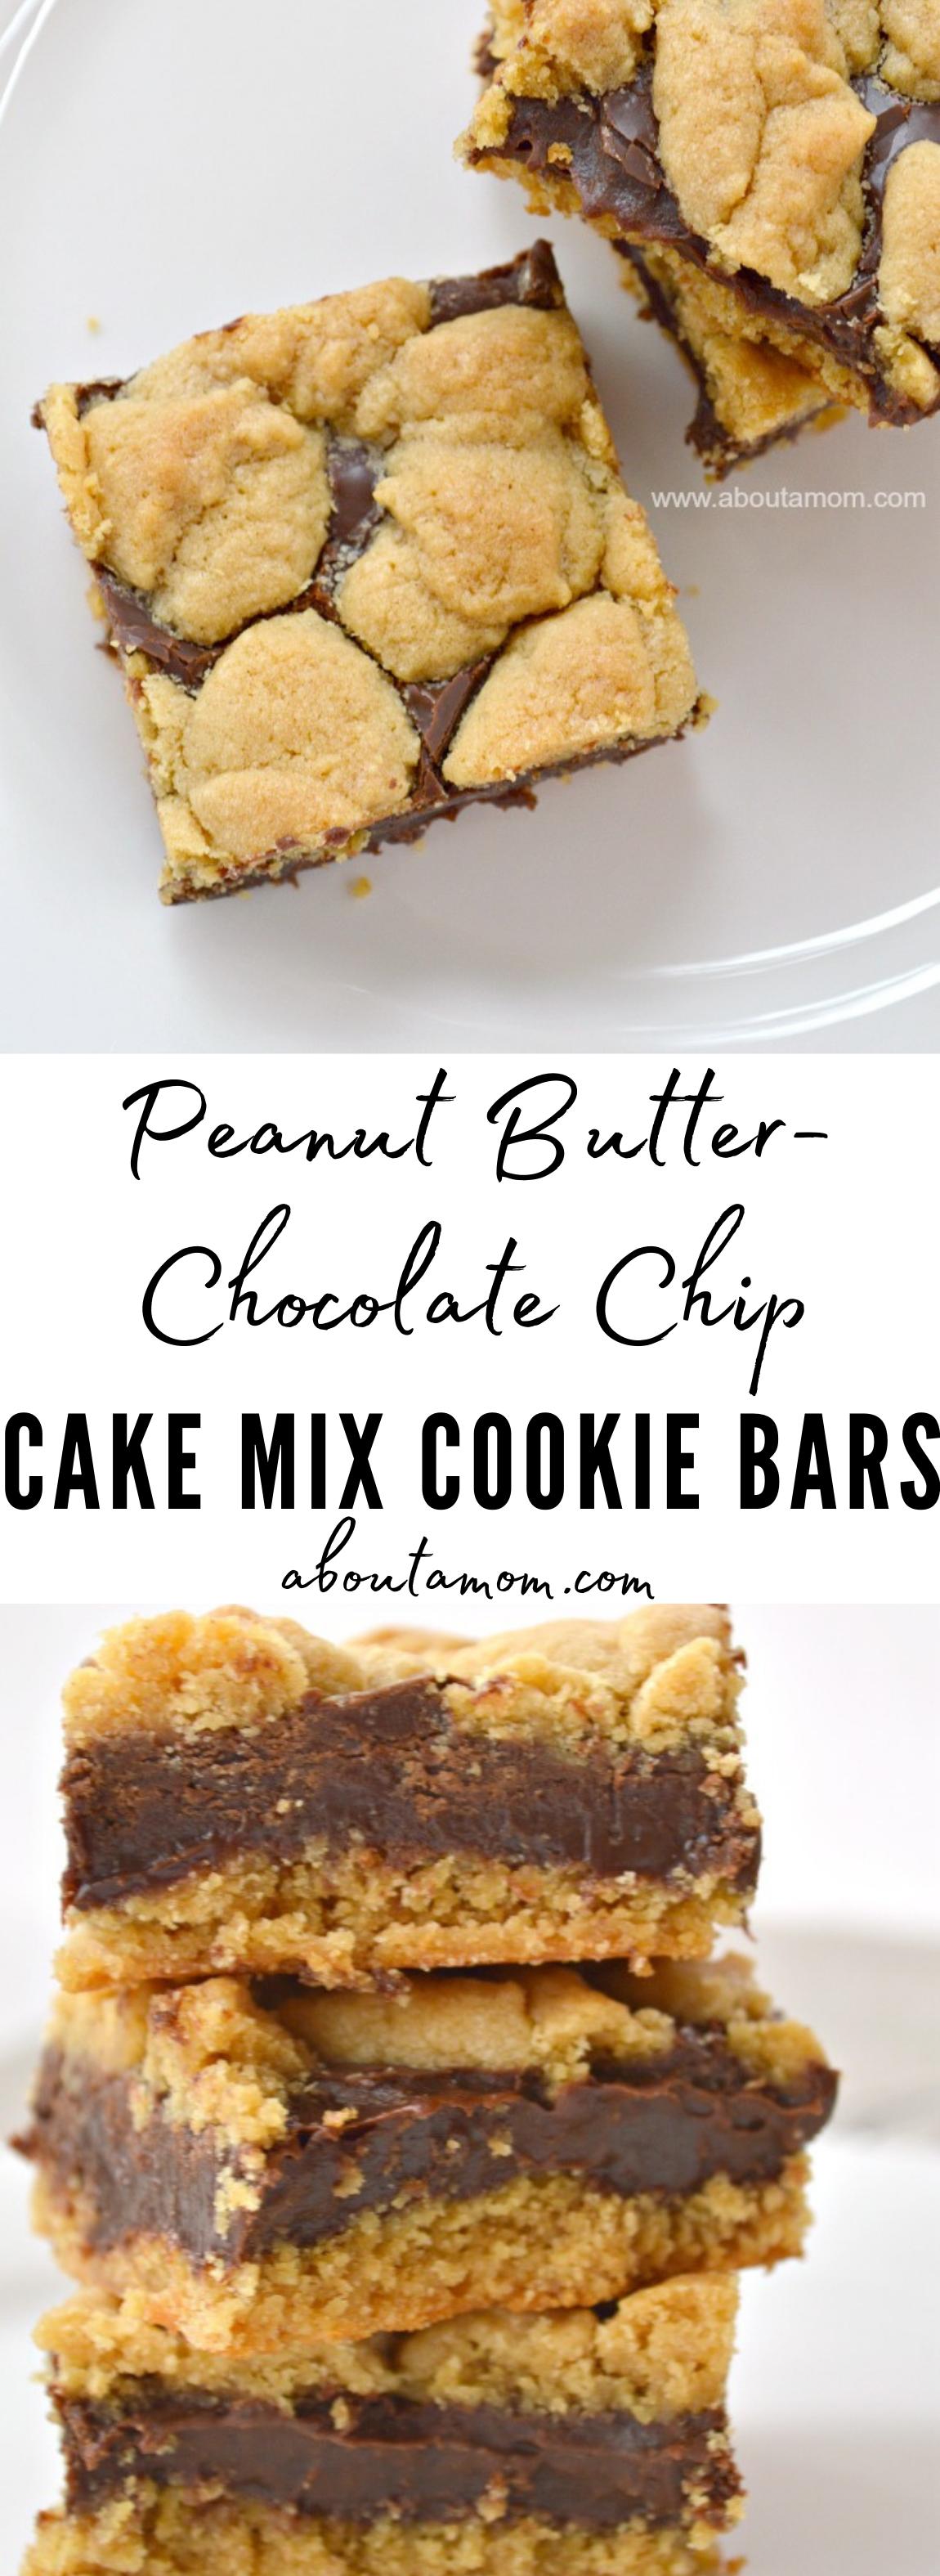 Peanut Butter-Chocolate Chip Cake Mix Cookie Bars Recipe